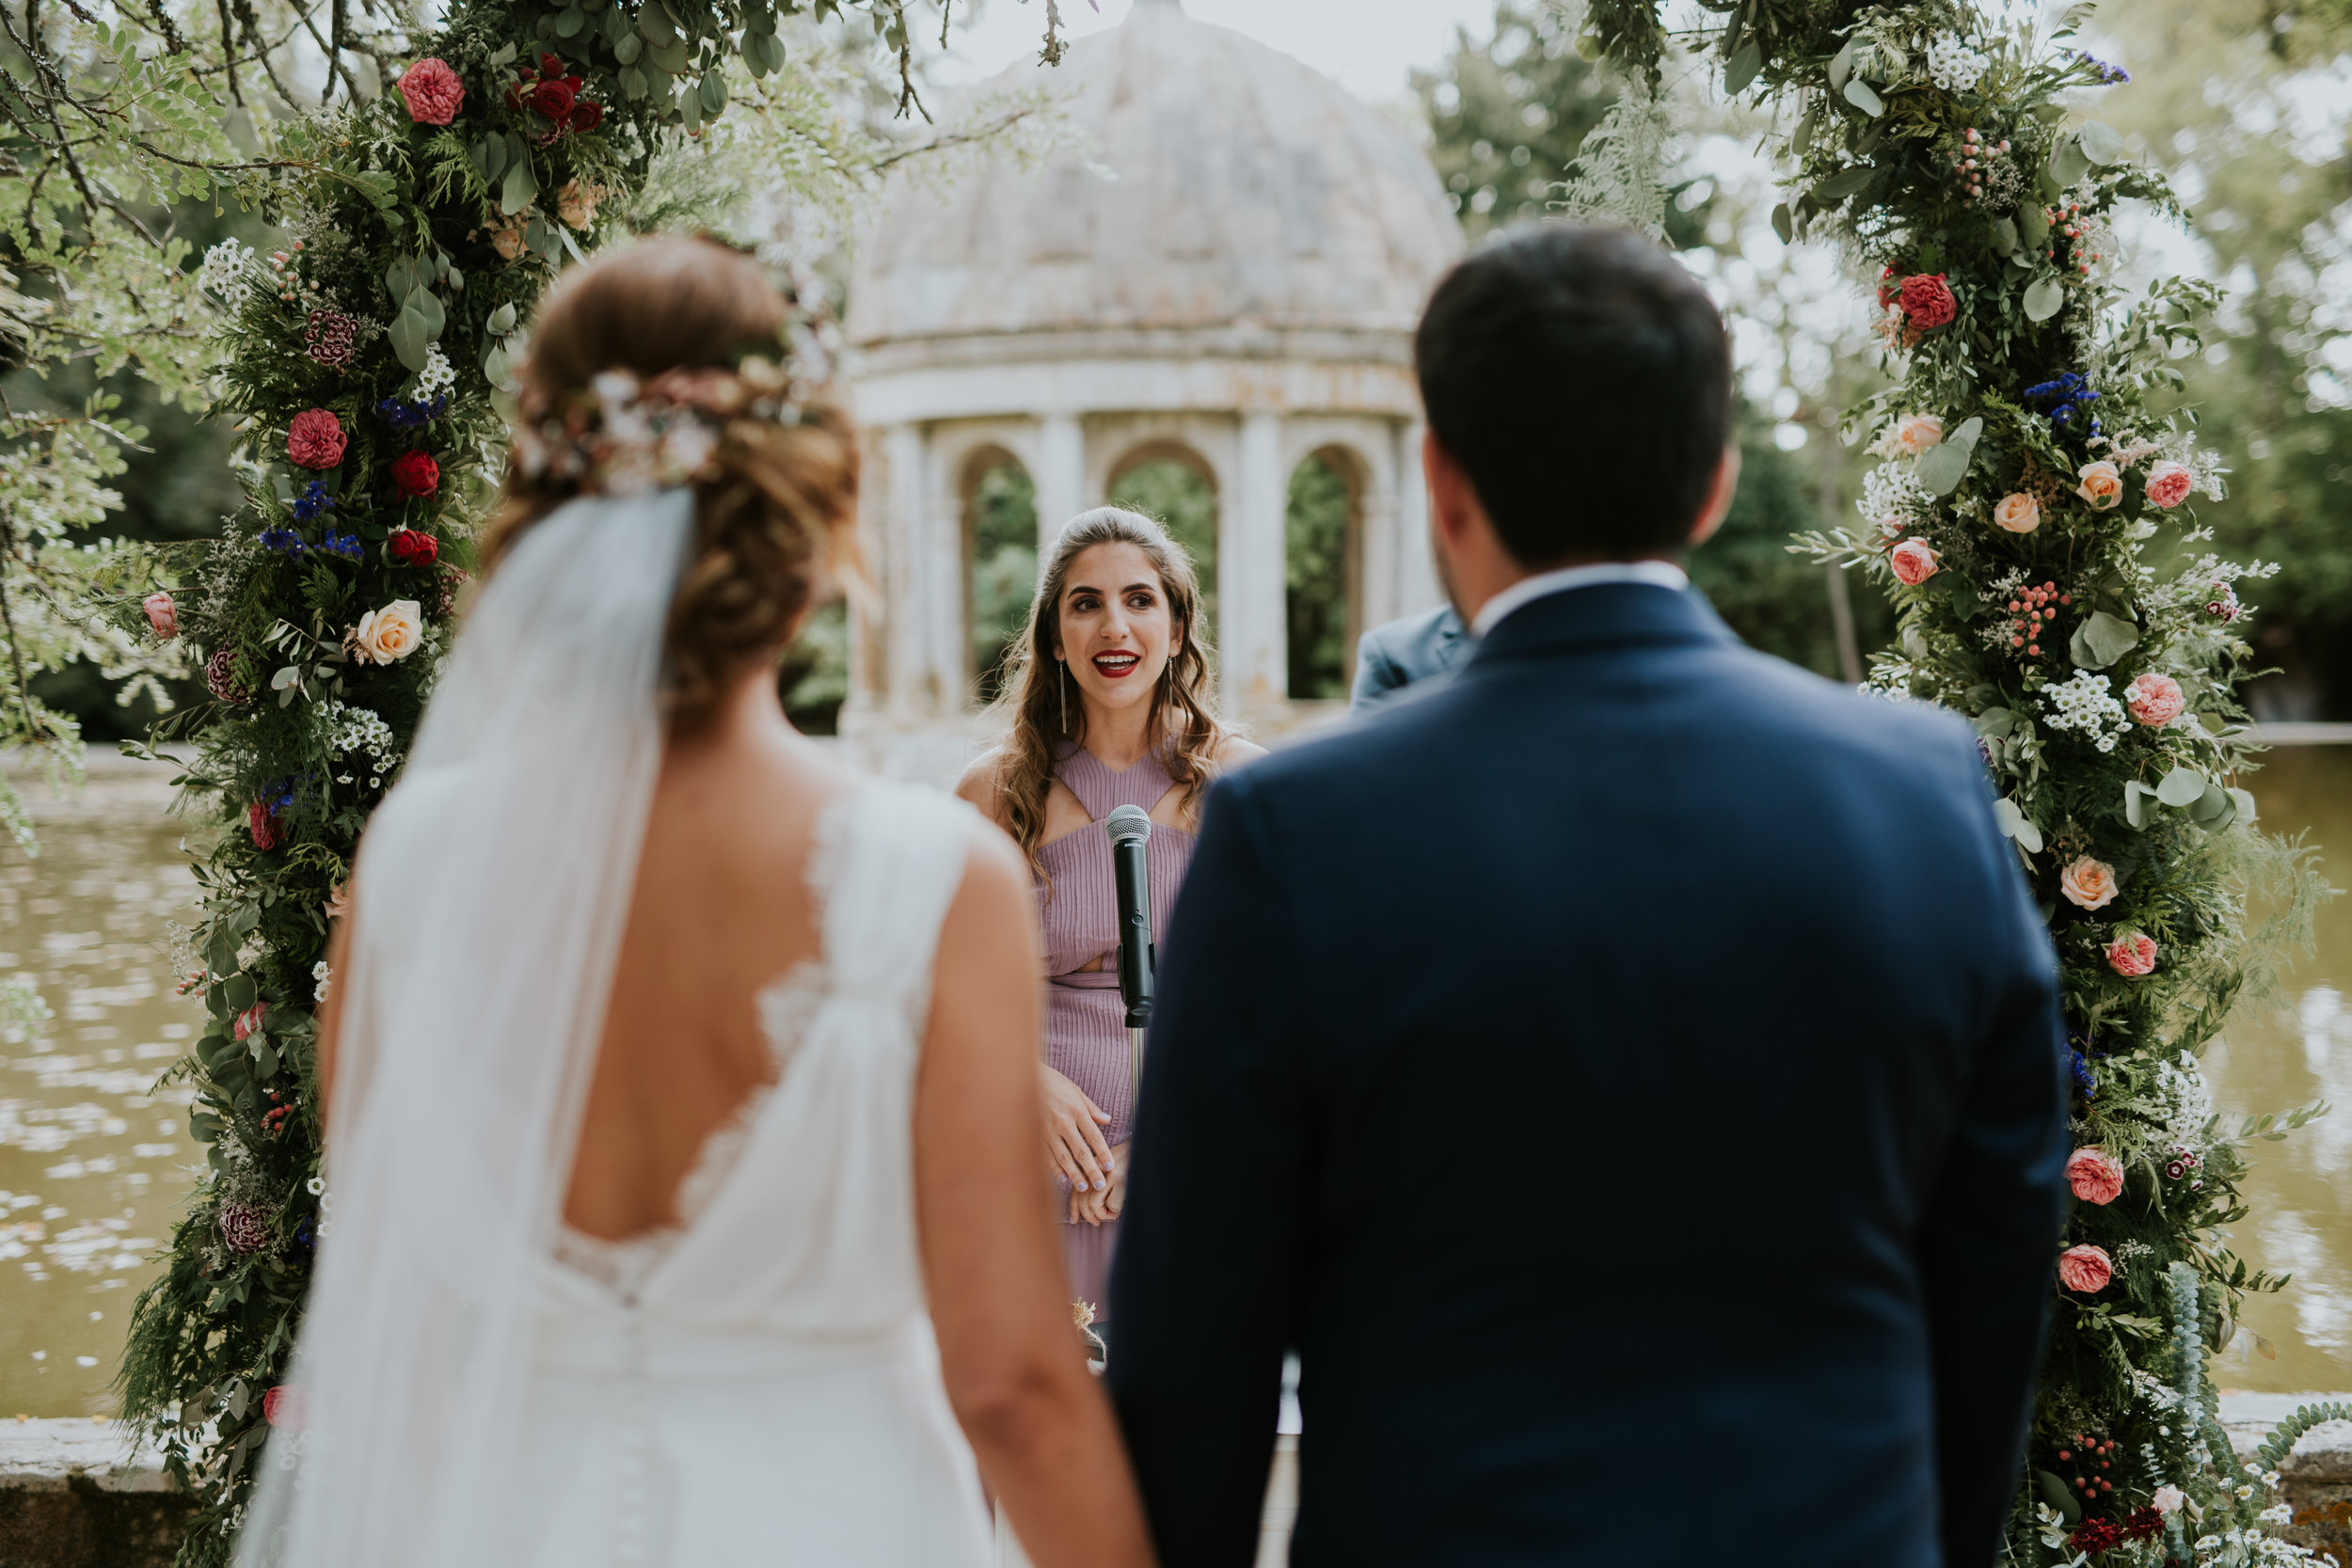 R&J248_ 09 setembro 2017 Wedding day_.jpg